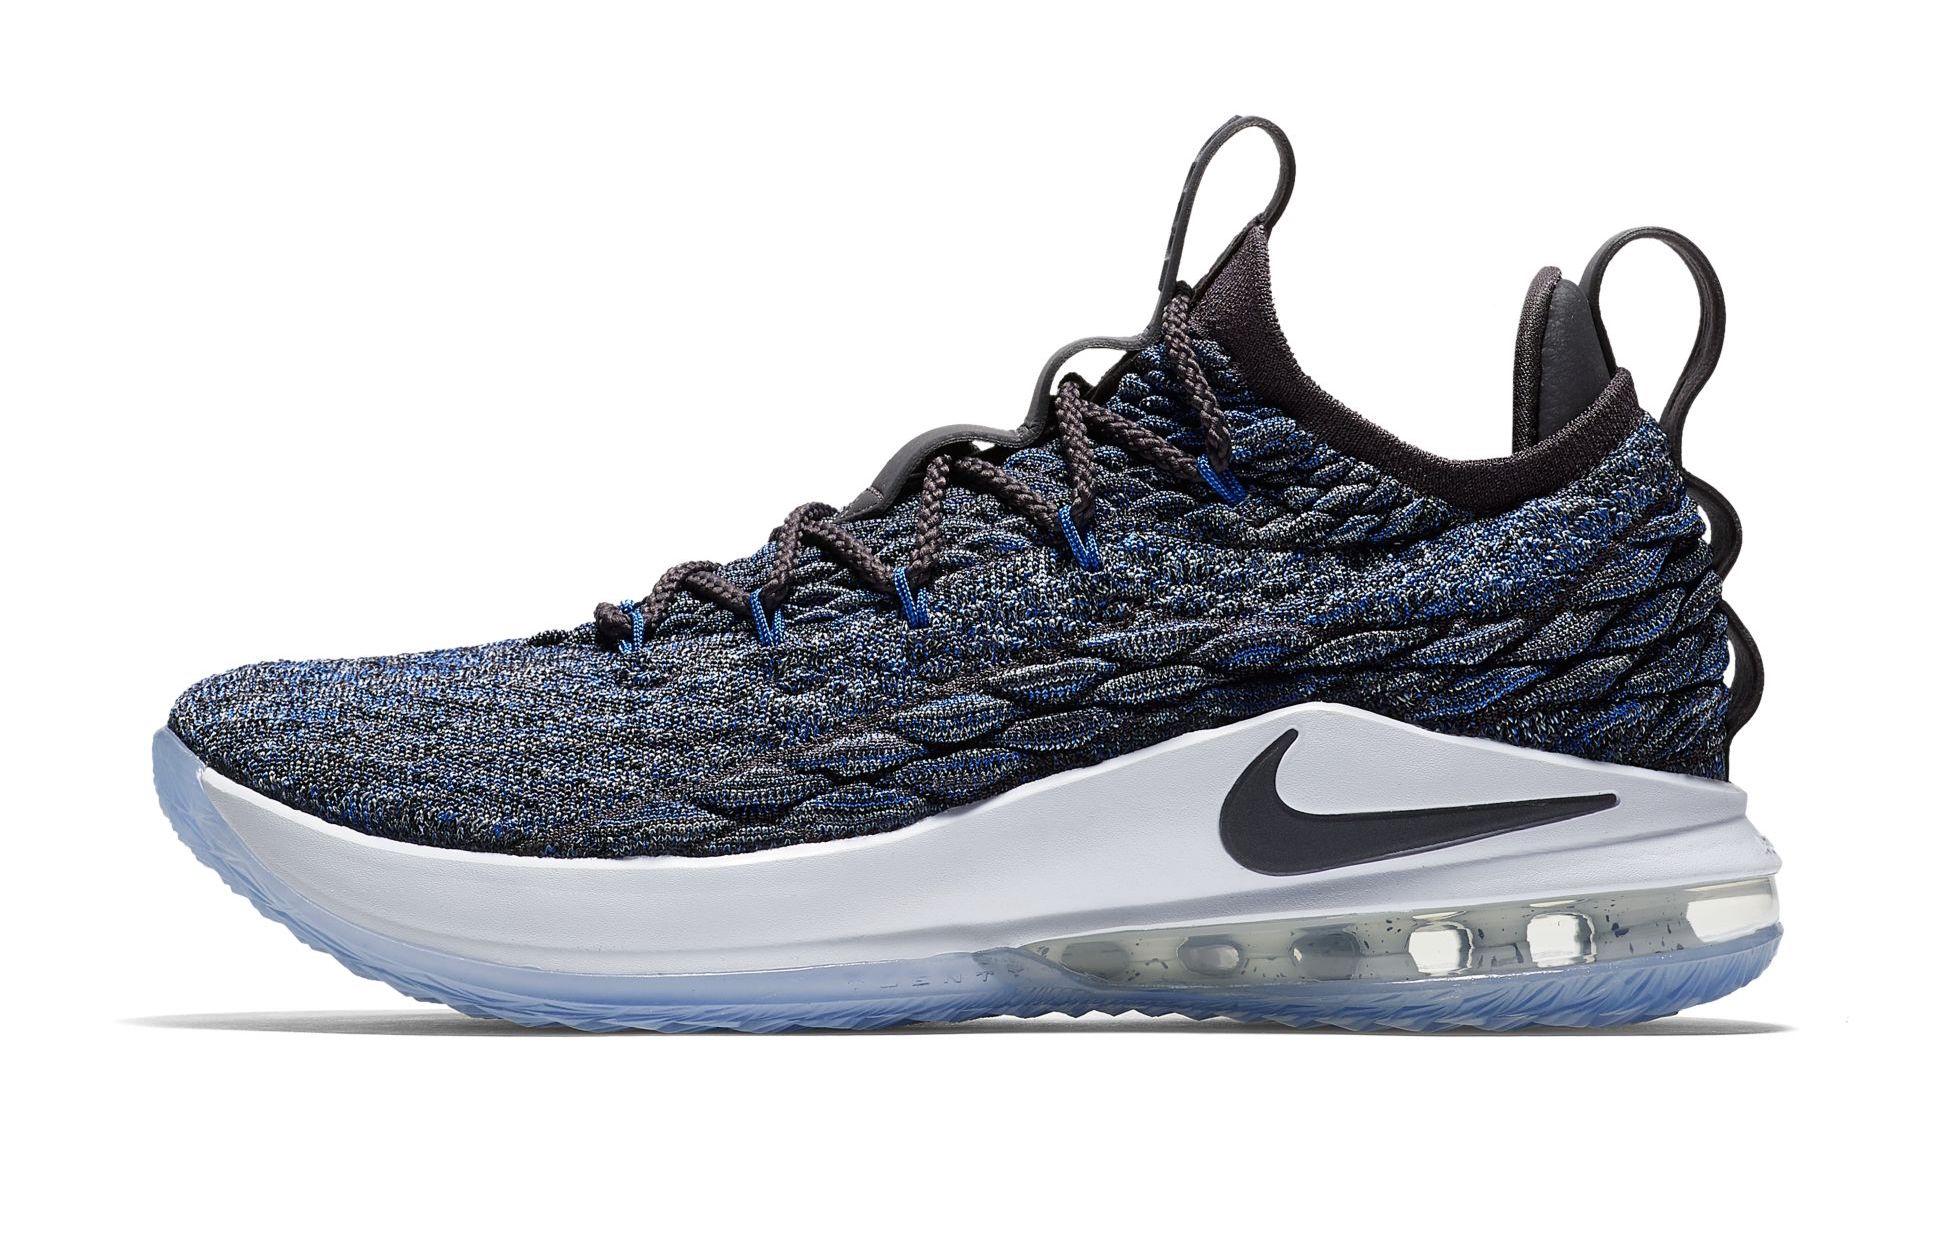 Nike LeBron 15 Low Signal Blue Arriving